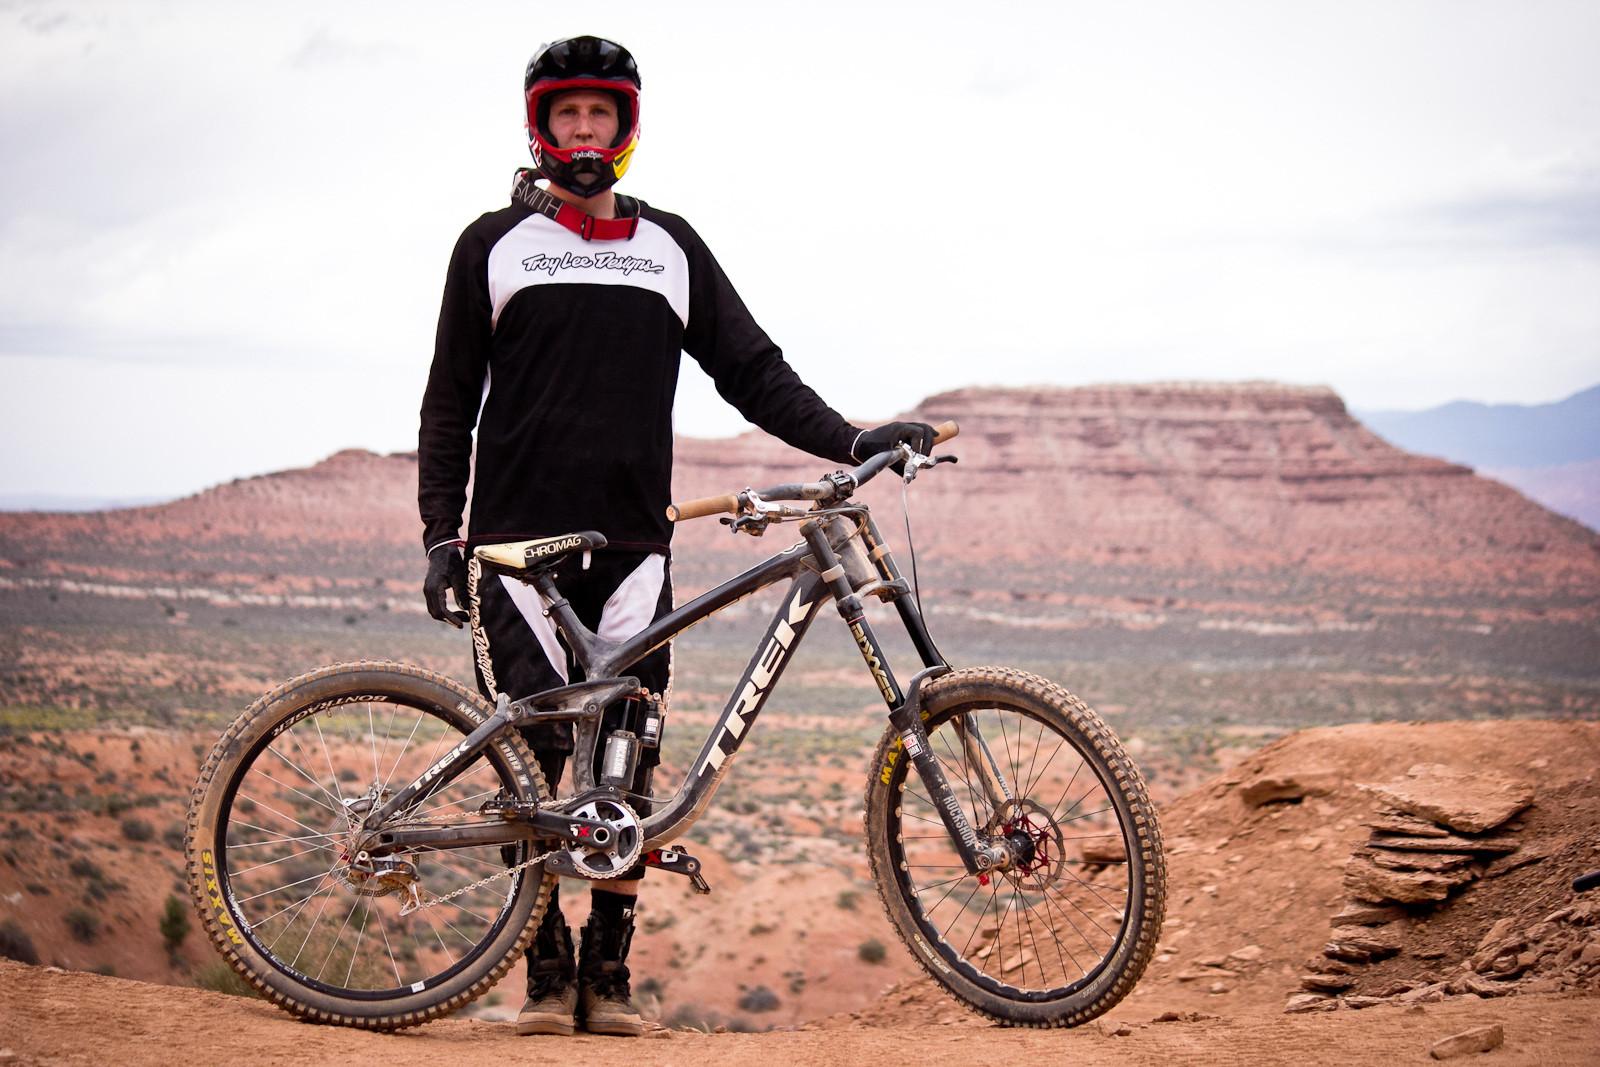 Rampage Pro Bike: Brandon Semenuk's Trek Session Park - Rampage Pro Bike: Brandon Semenuk's Trek Session Park - Mountain Biking Pictures - Vital MTB